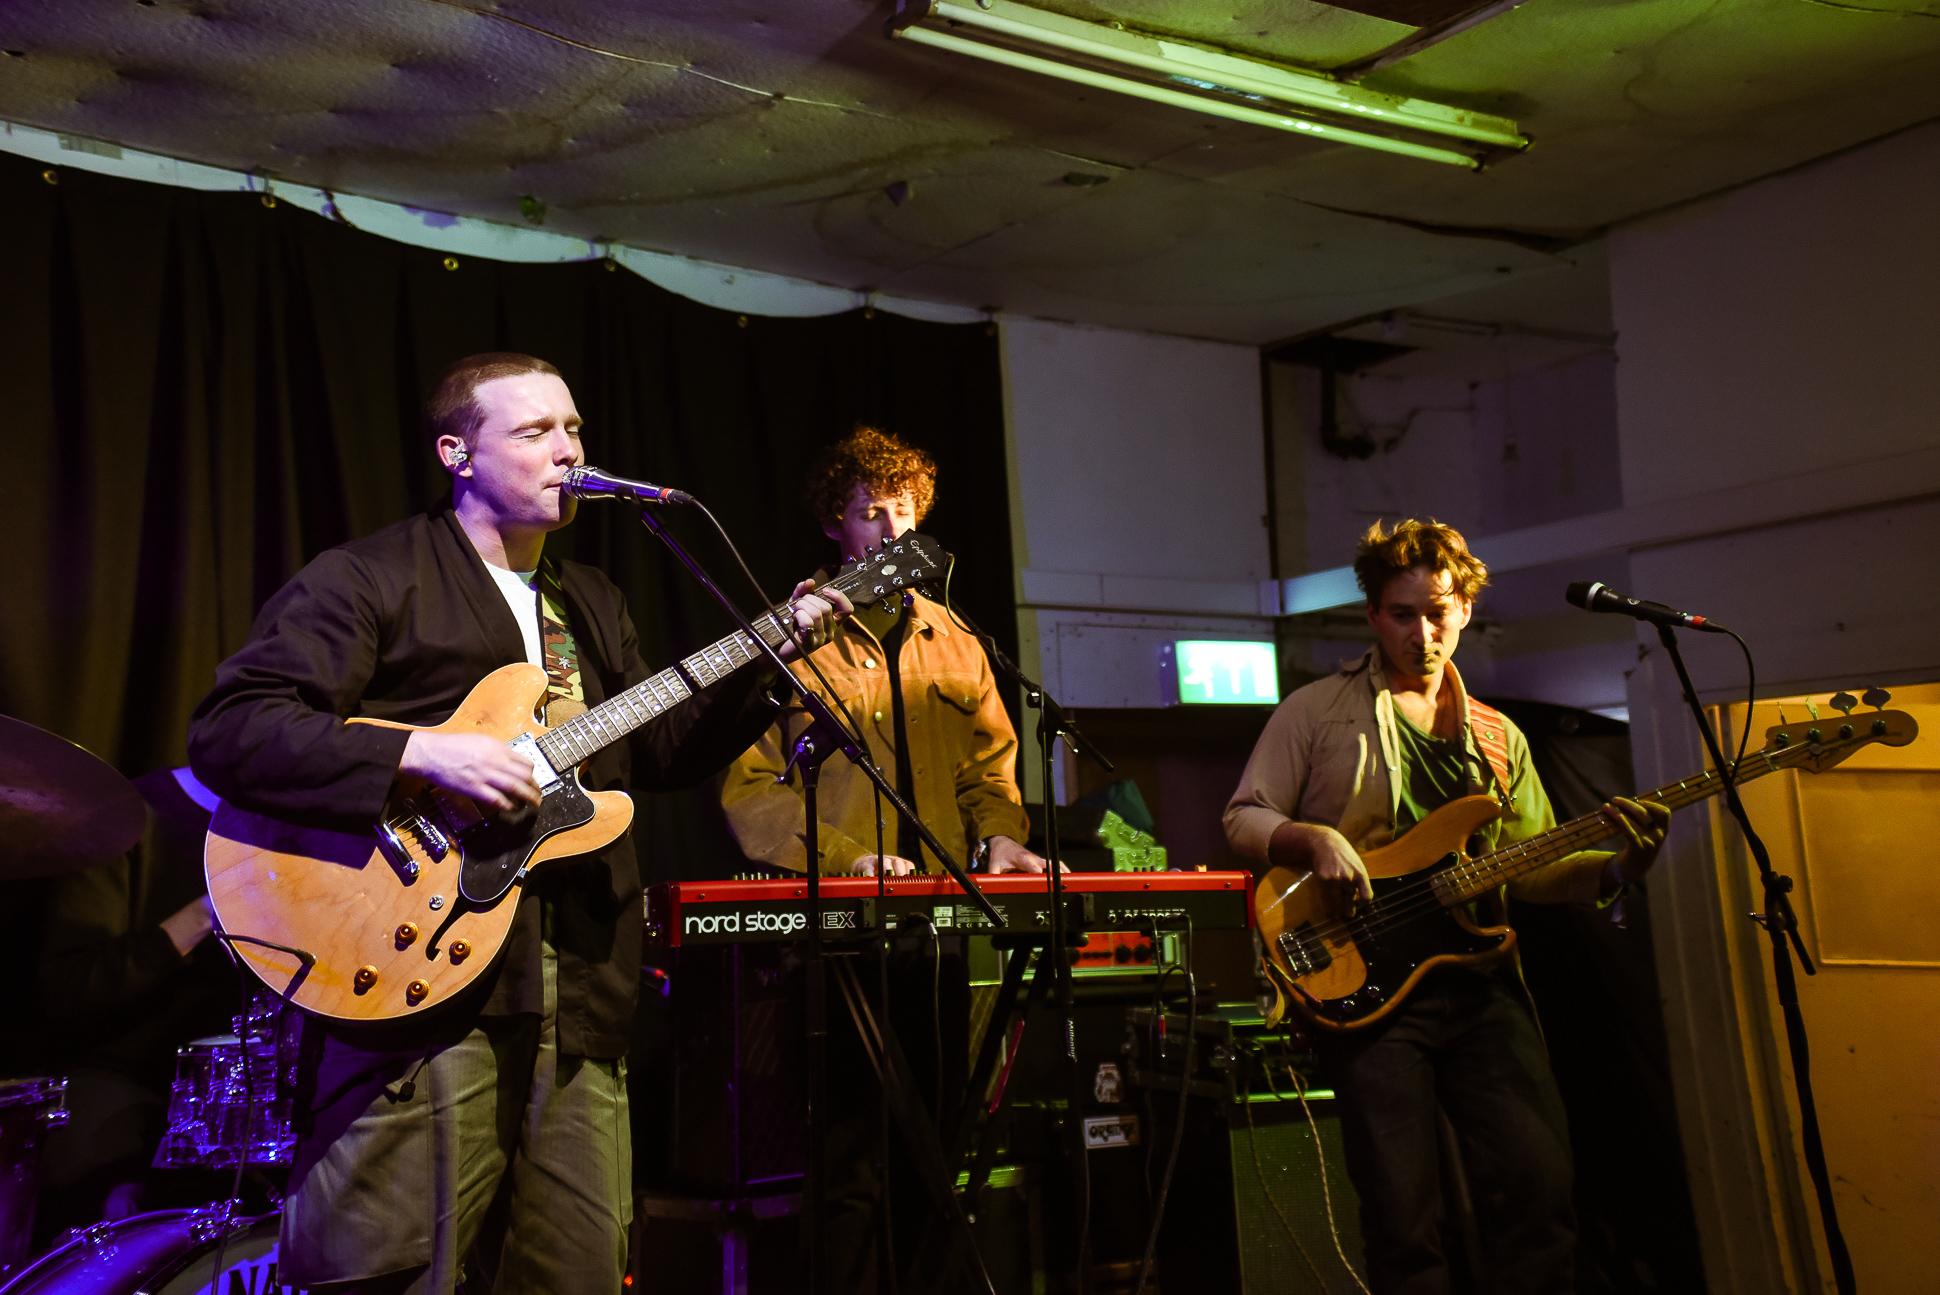 Live At Leeds 2019 - VC Pines-3.jpg